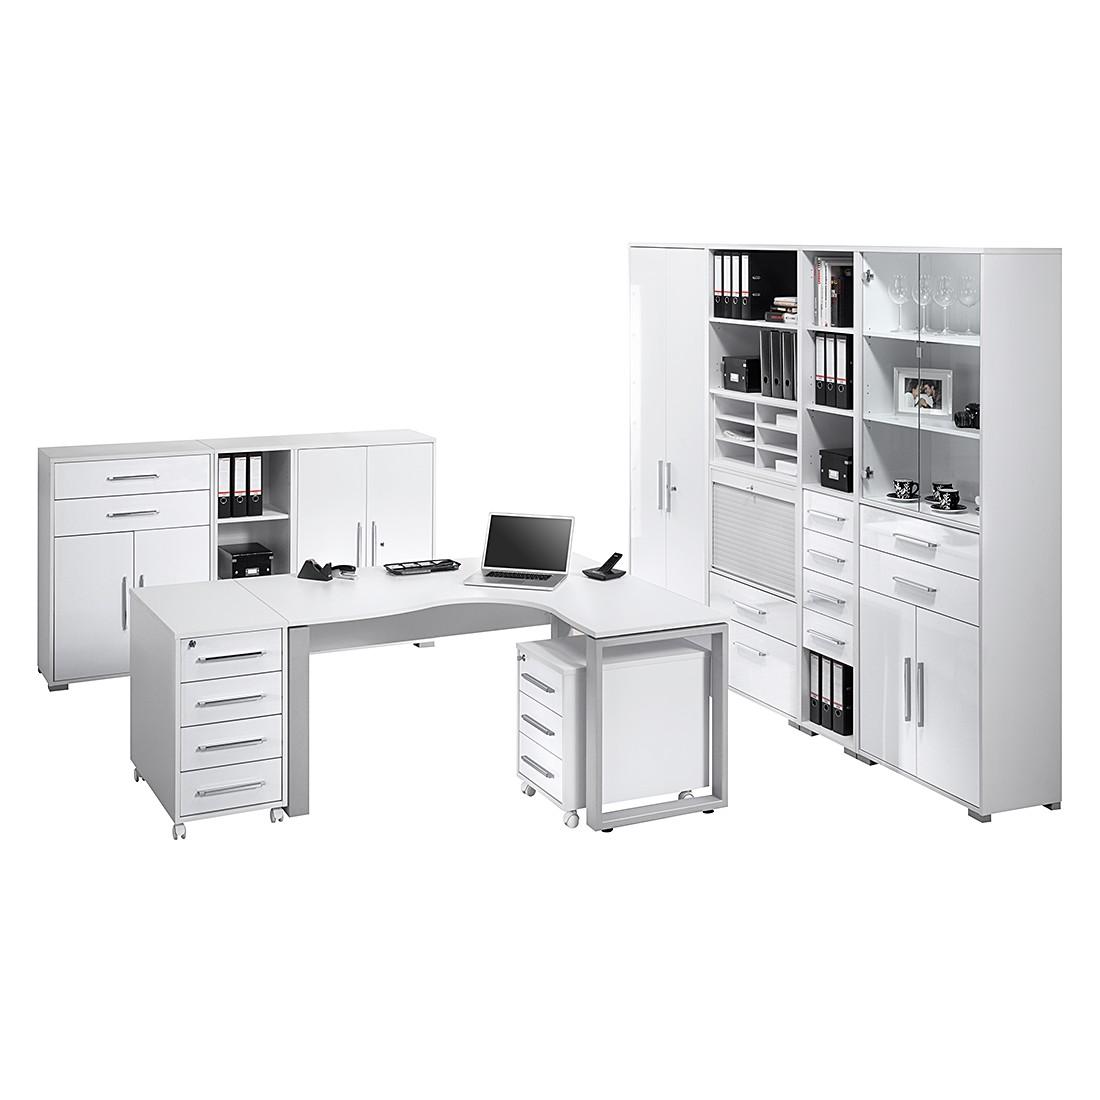 Bürosparset Merit IX (10-teilig) – Icy Weiß/Hochglanz Weiß, Maja Möbel günstig kaufen